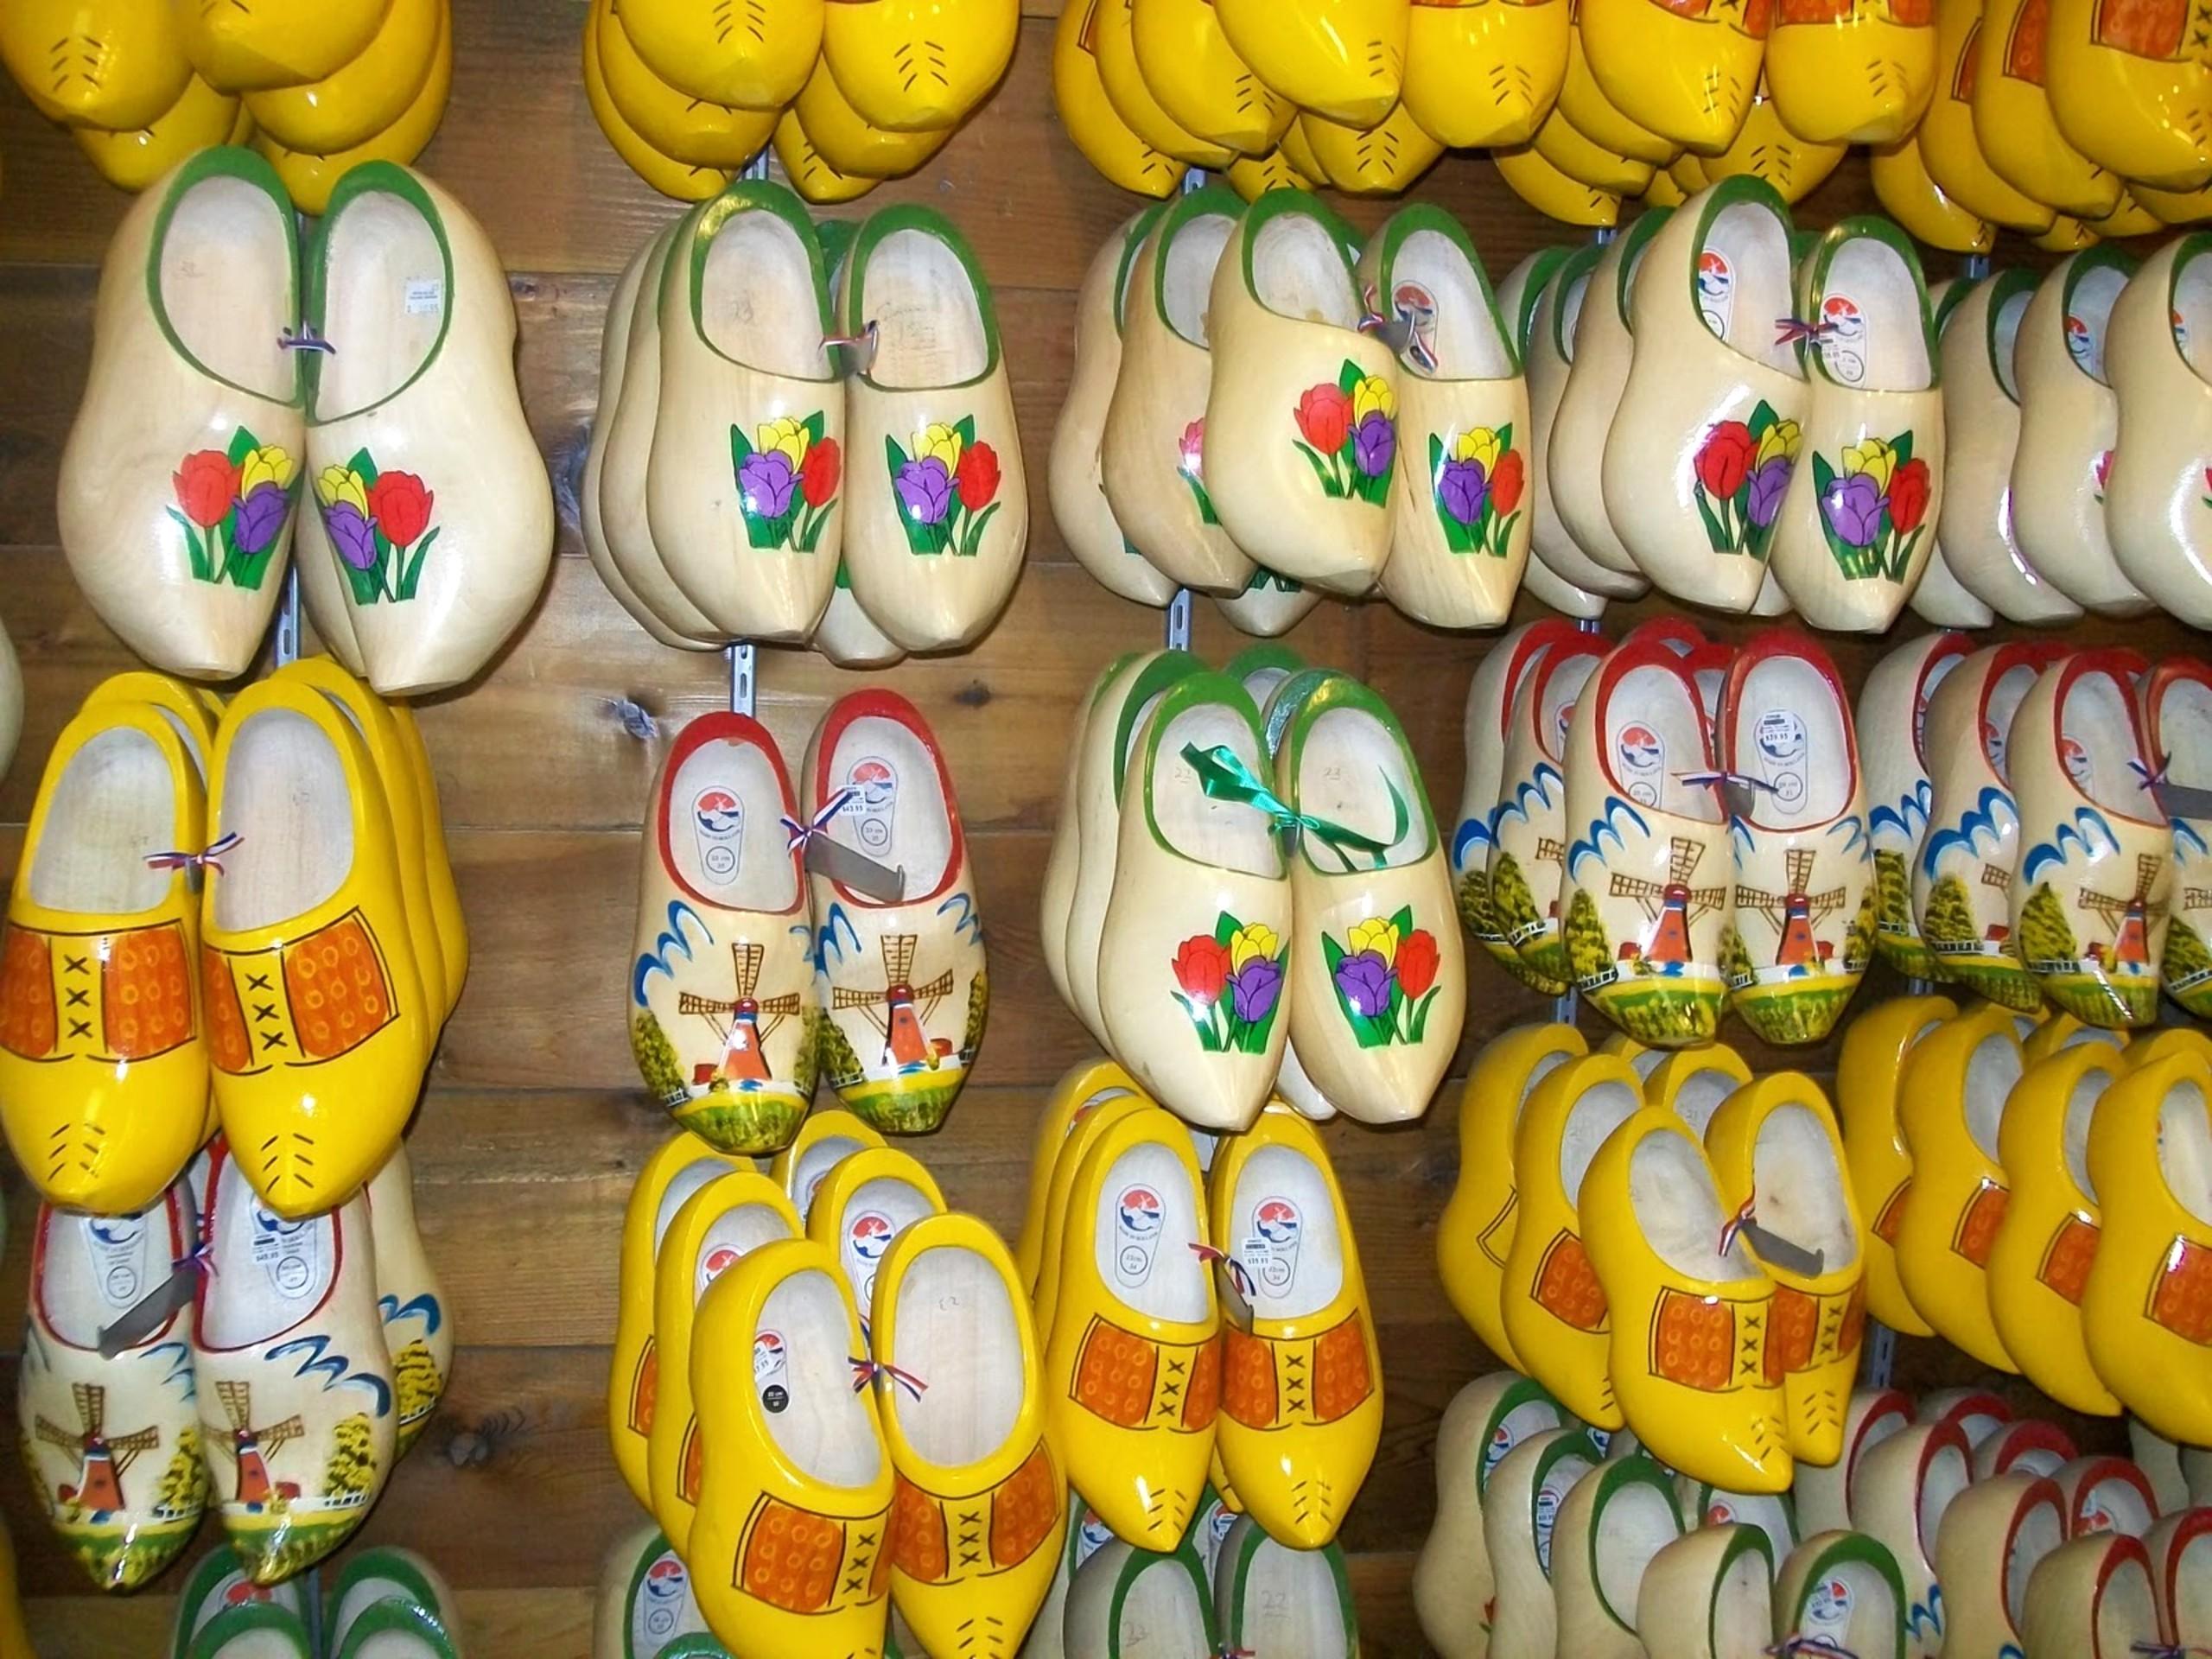 Wooden shoes Volendam